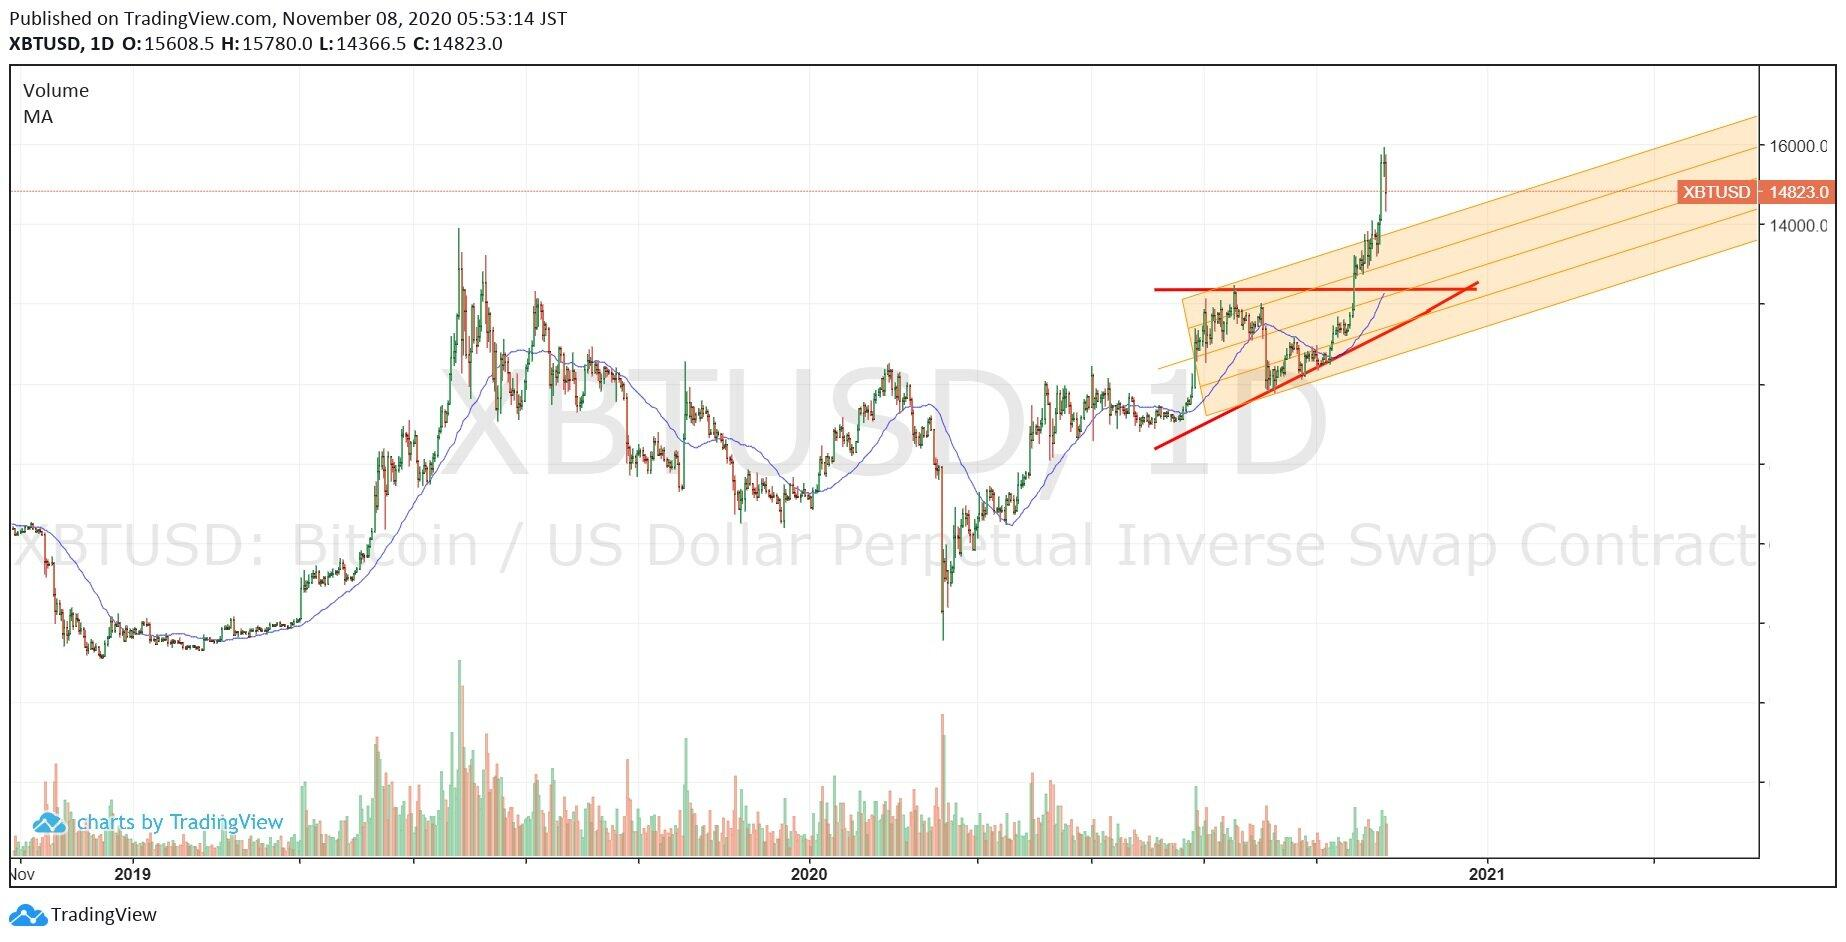 出典:https://www.tradingview.com/x/dJ4pjXPg